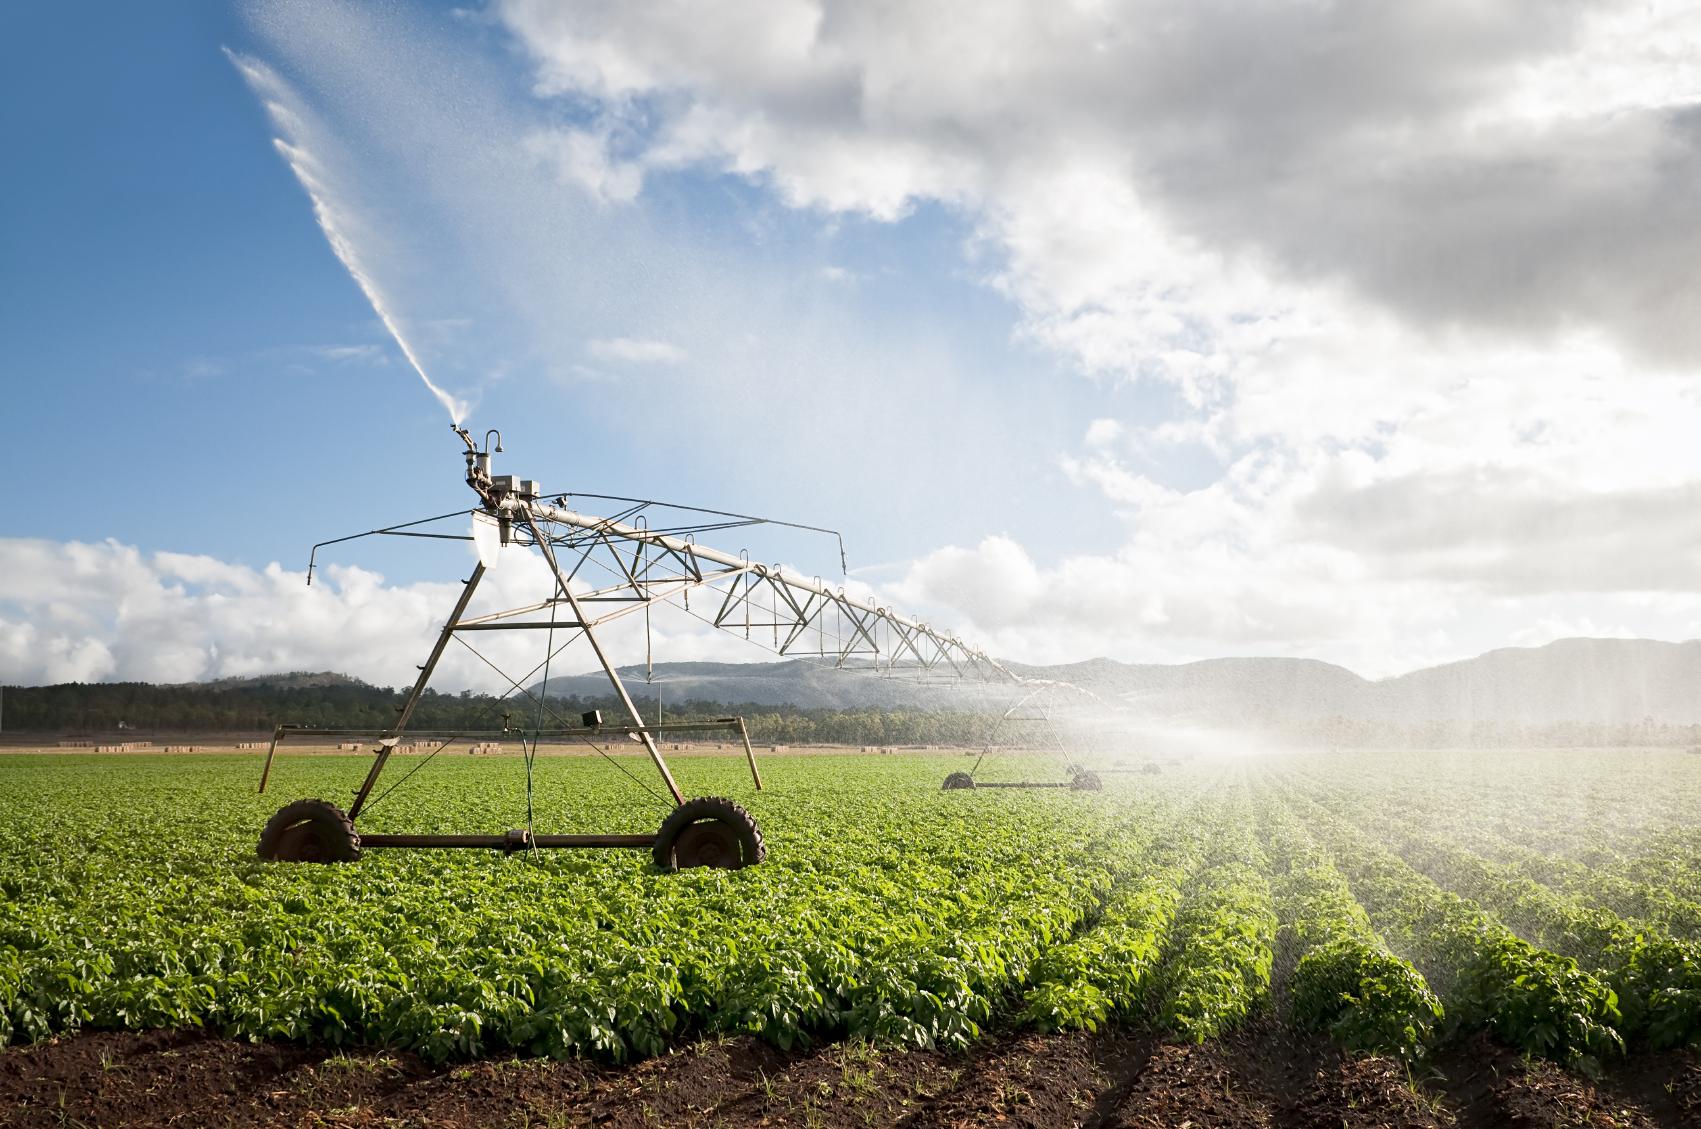 An irrigation machine on a potato field in Australia.